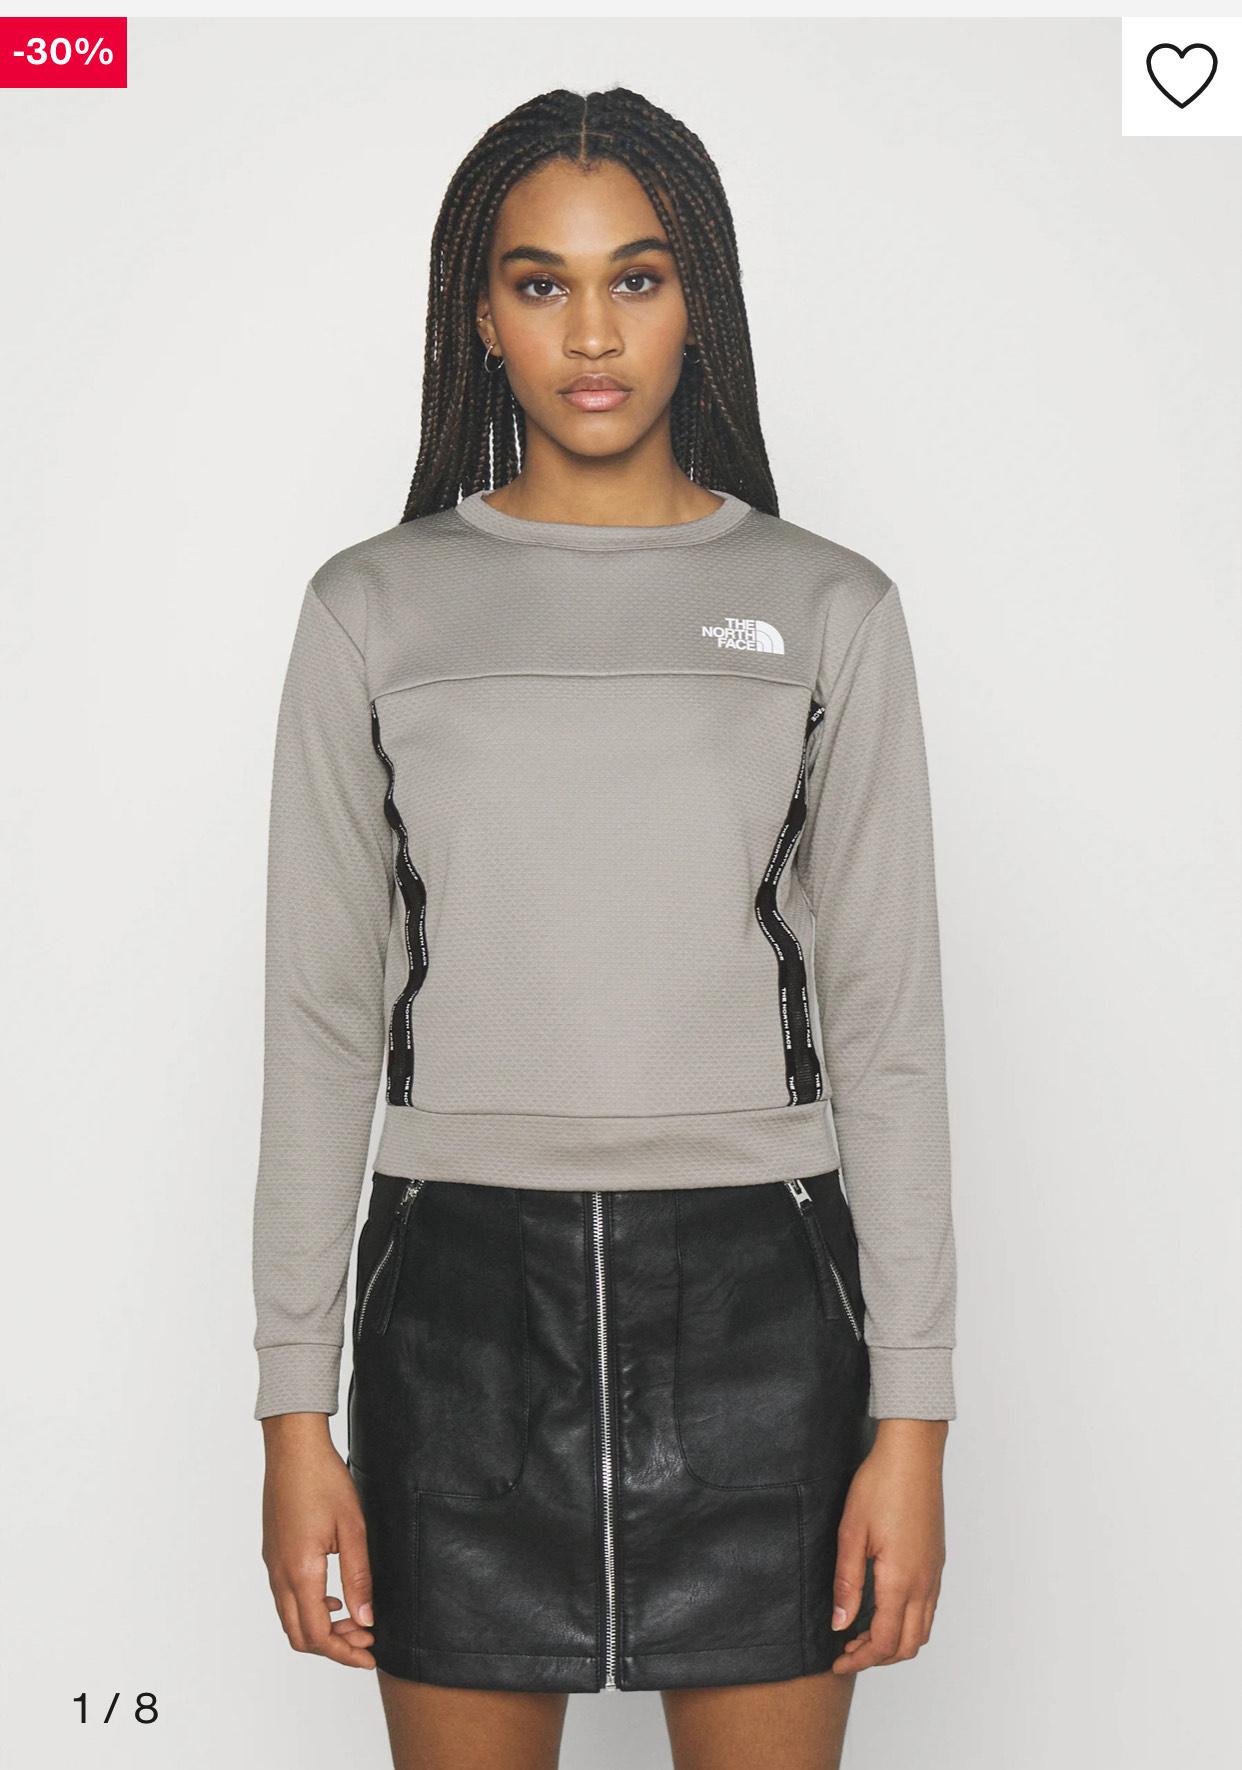 Women's The North Face Sweatshirt £41.99 delivered @ Zalando